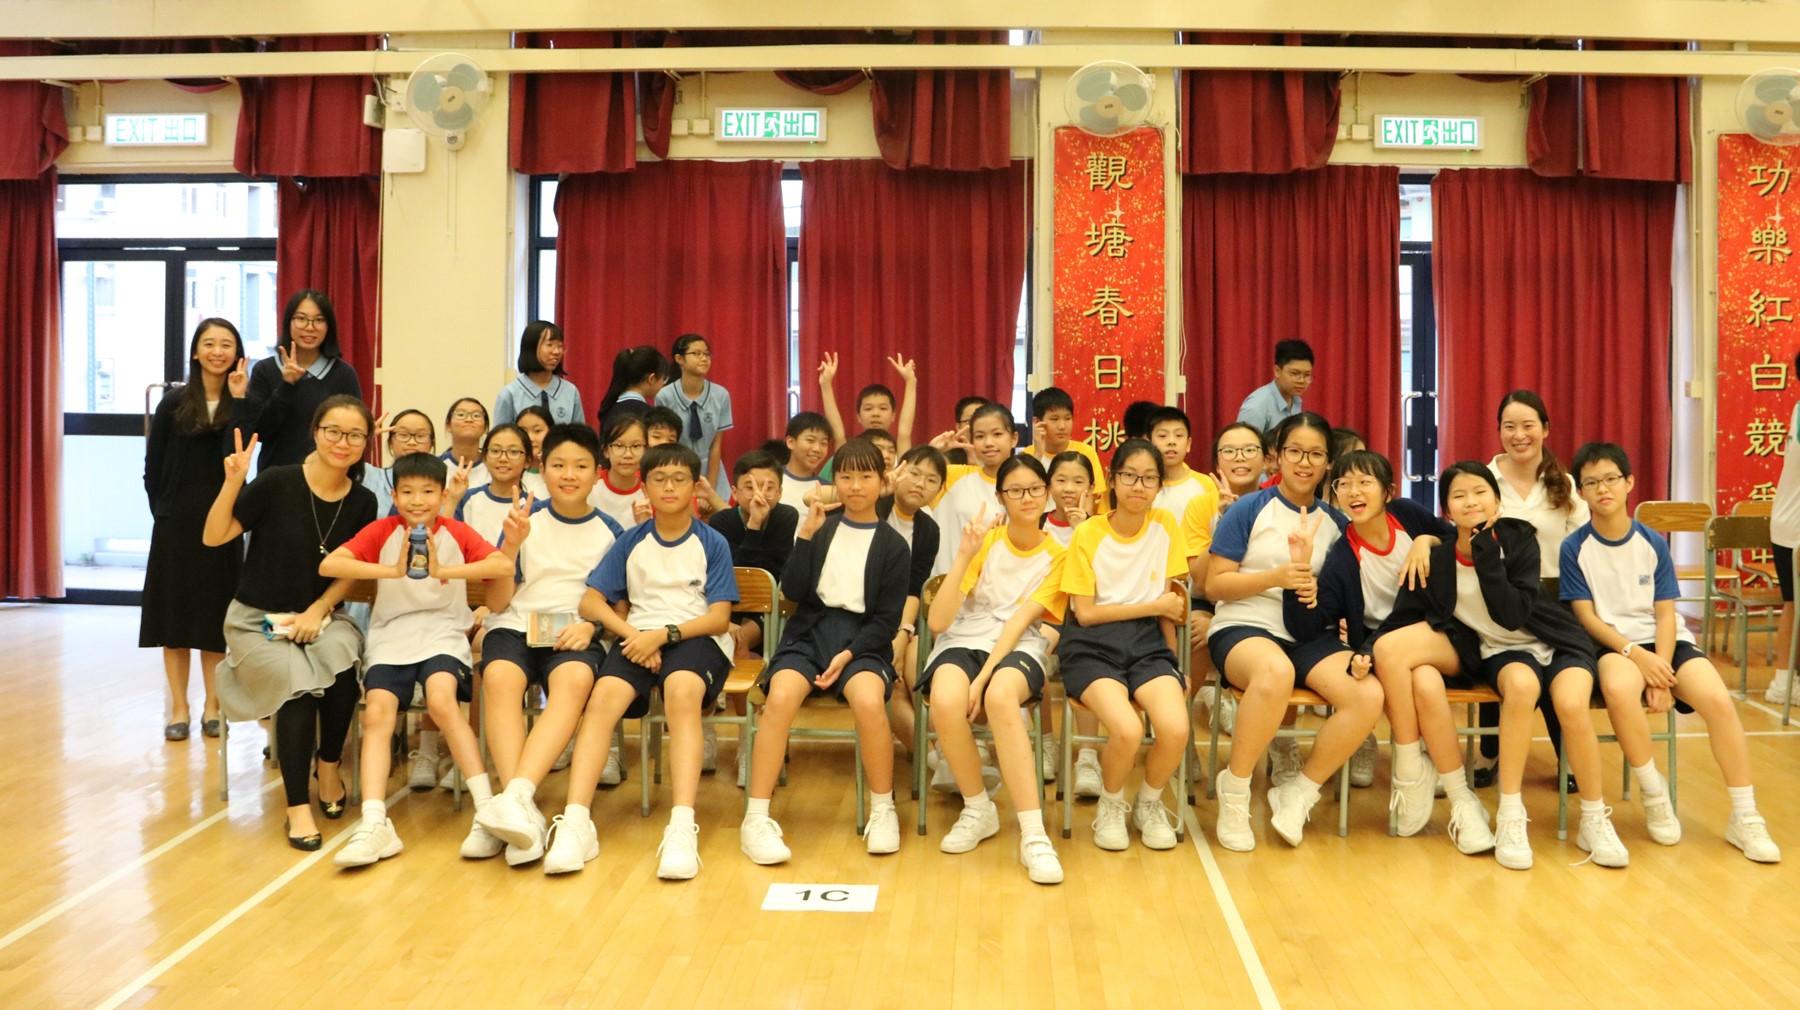 http://npc.edu.hk/sites/default/files/img_6493.jpg